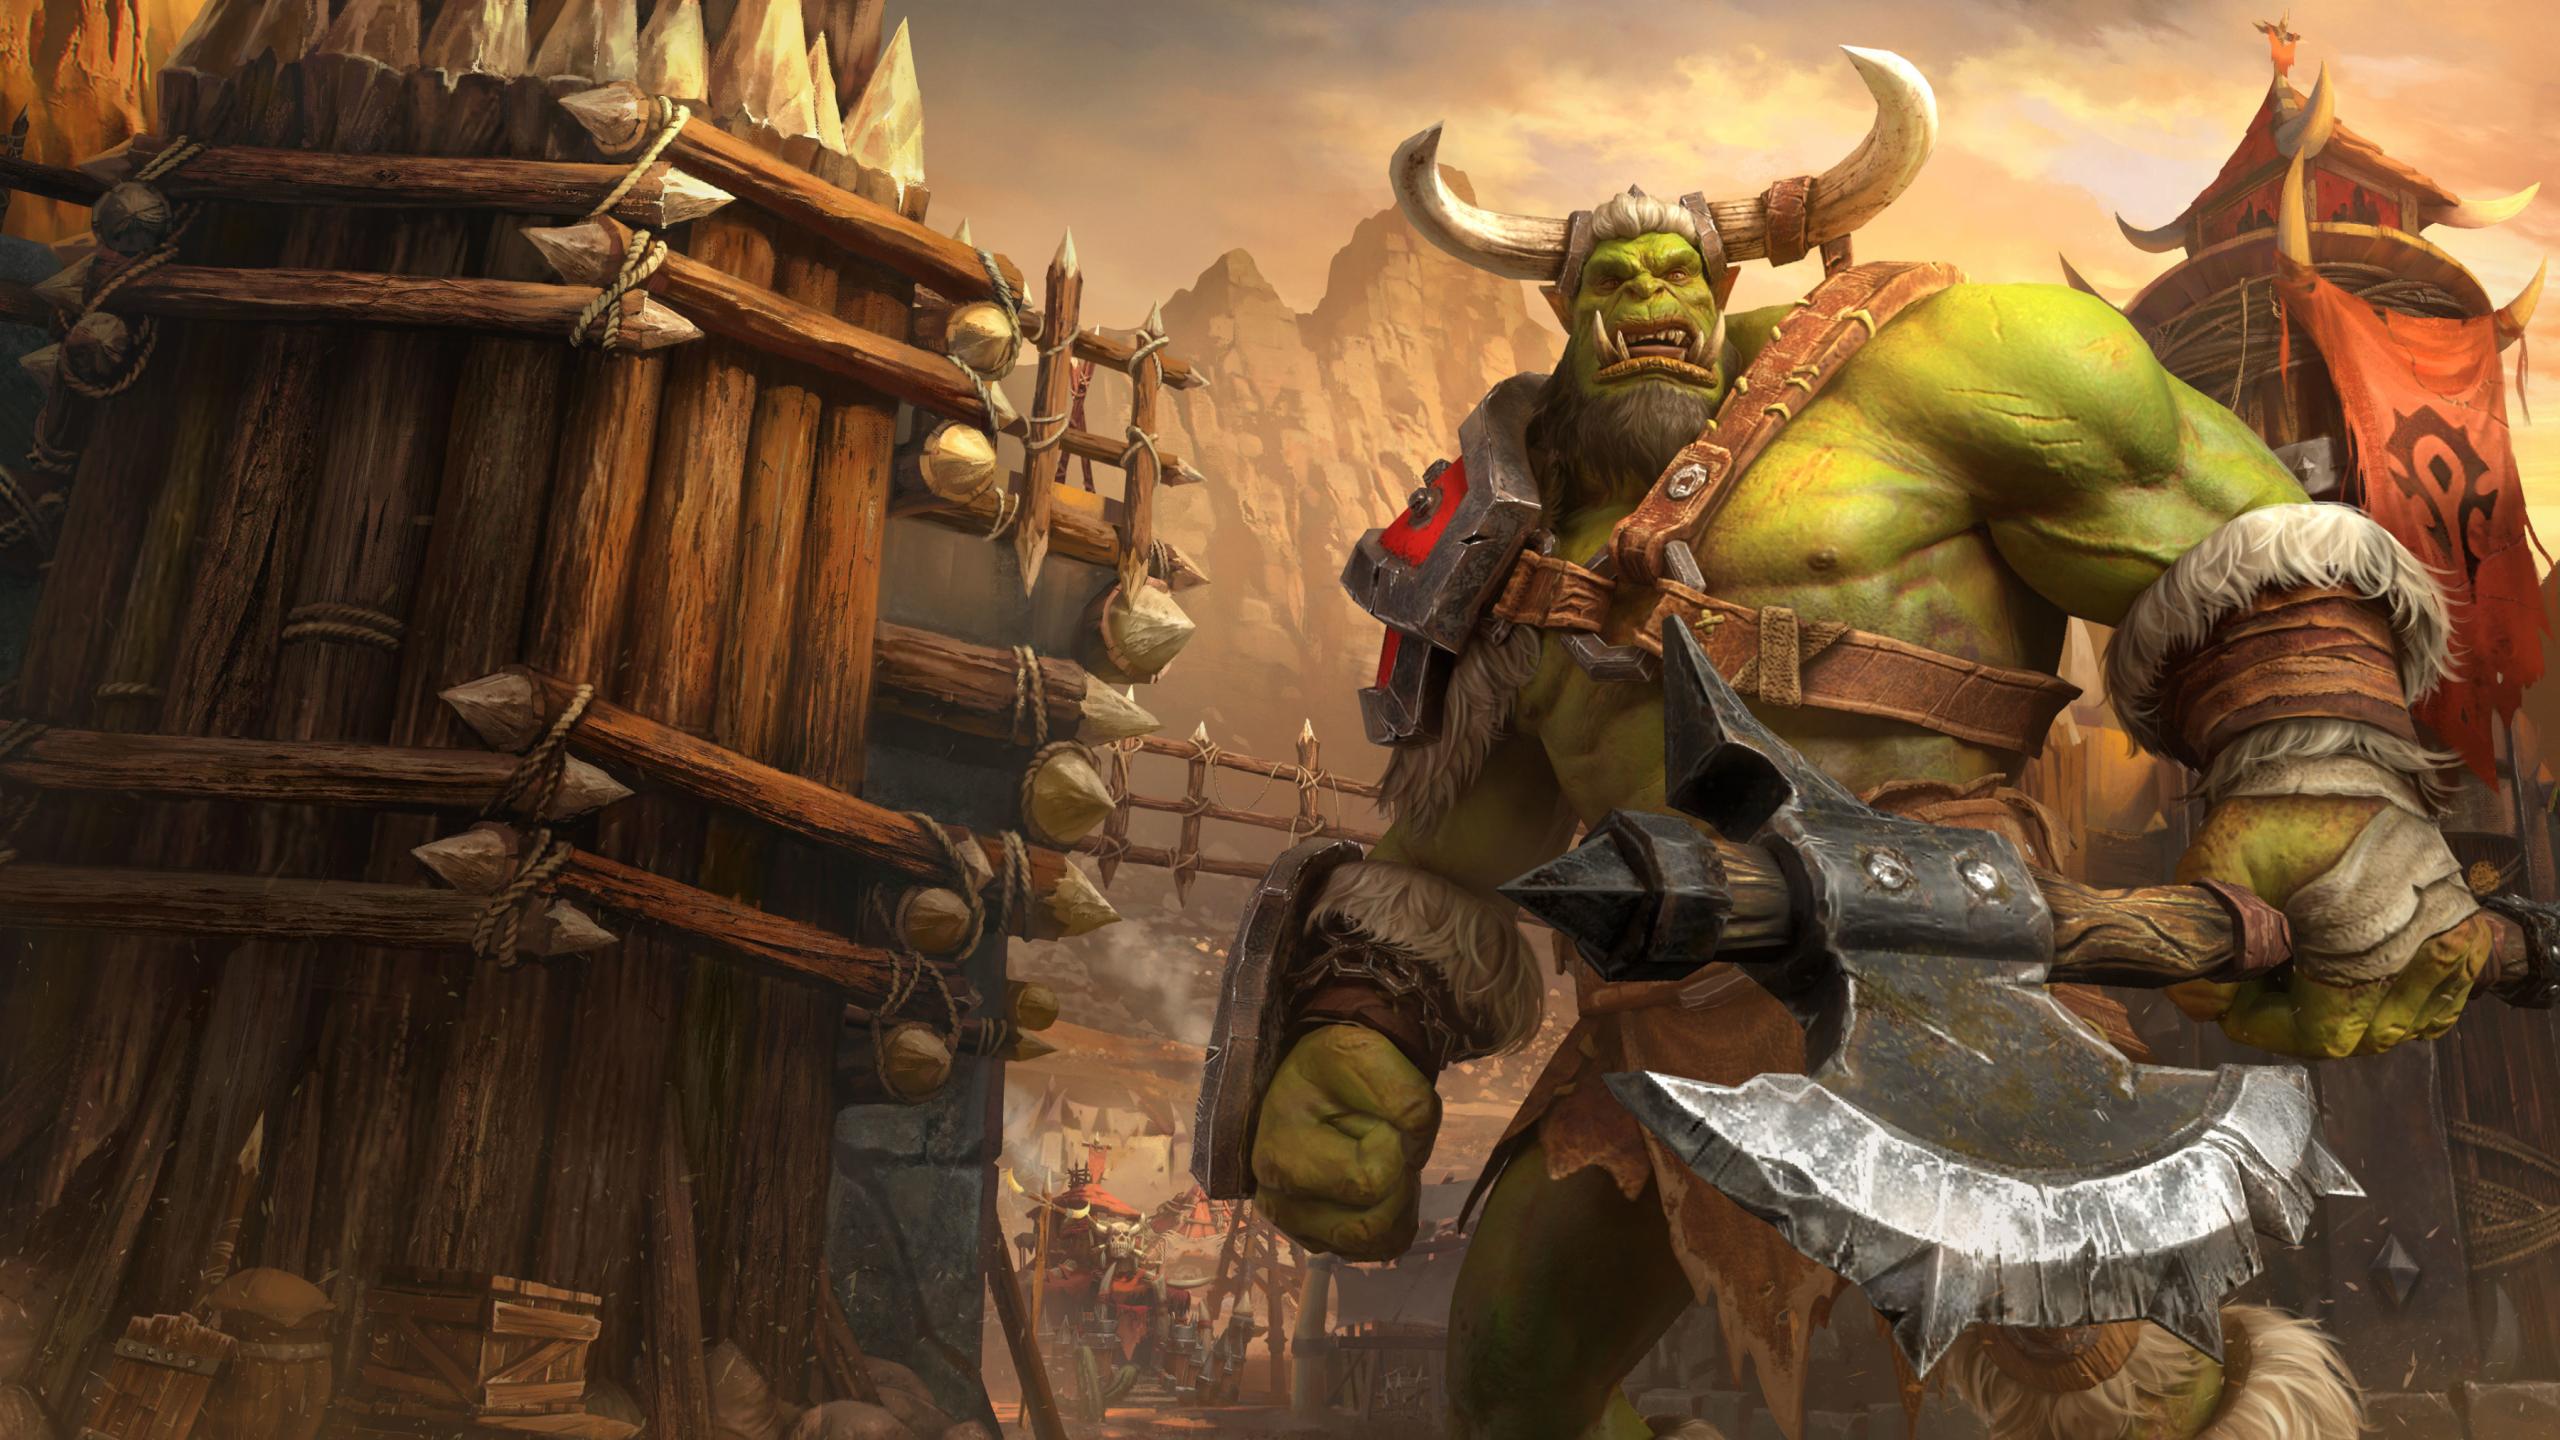 2560x1440 Warcraft 3 4k 1440p Resolution Wallpaper Hd Games 4k